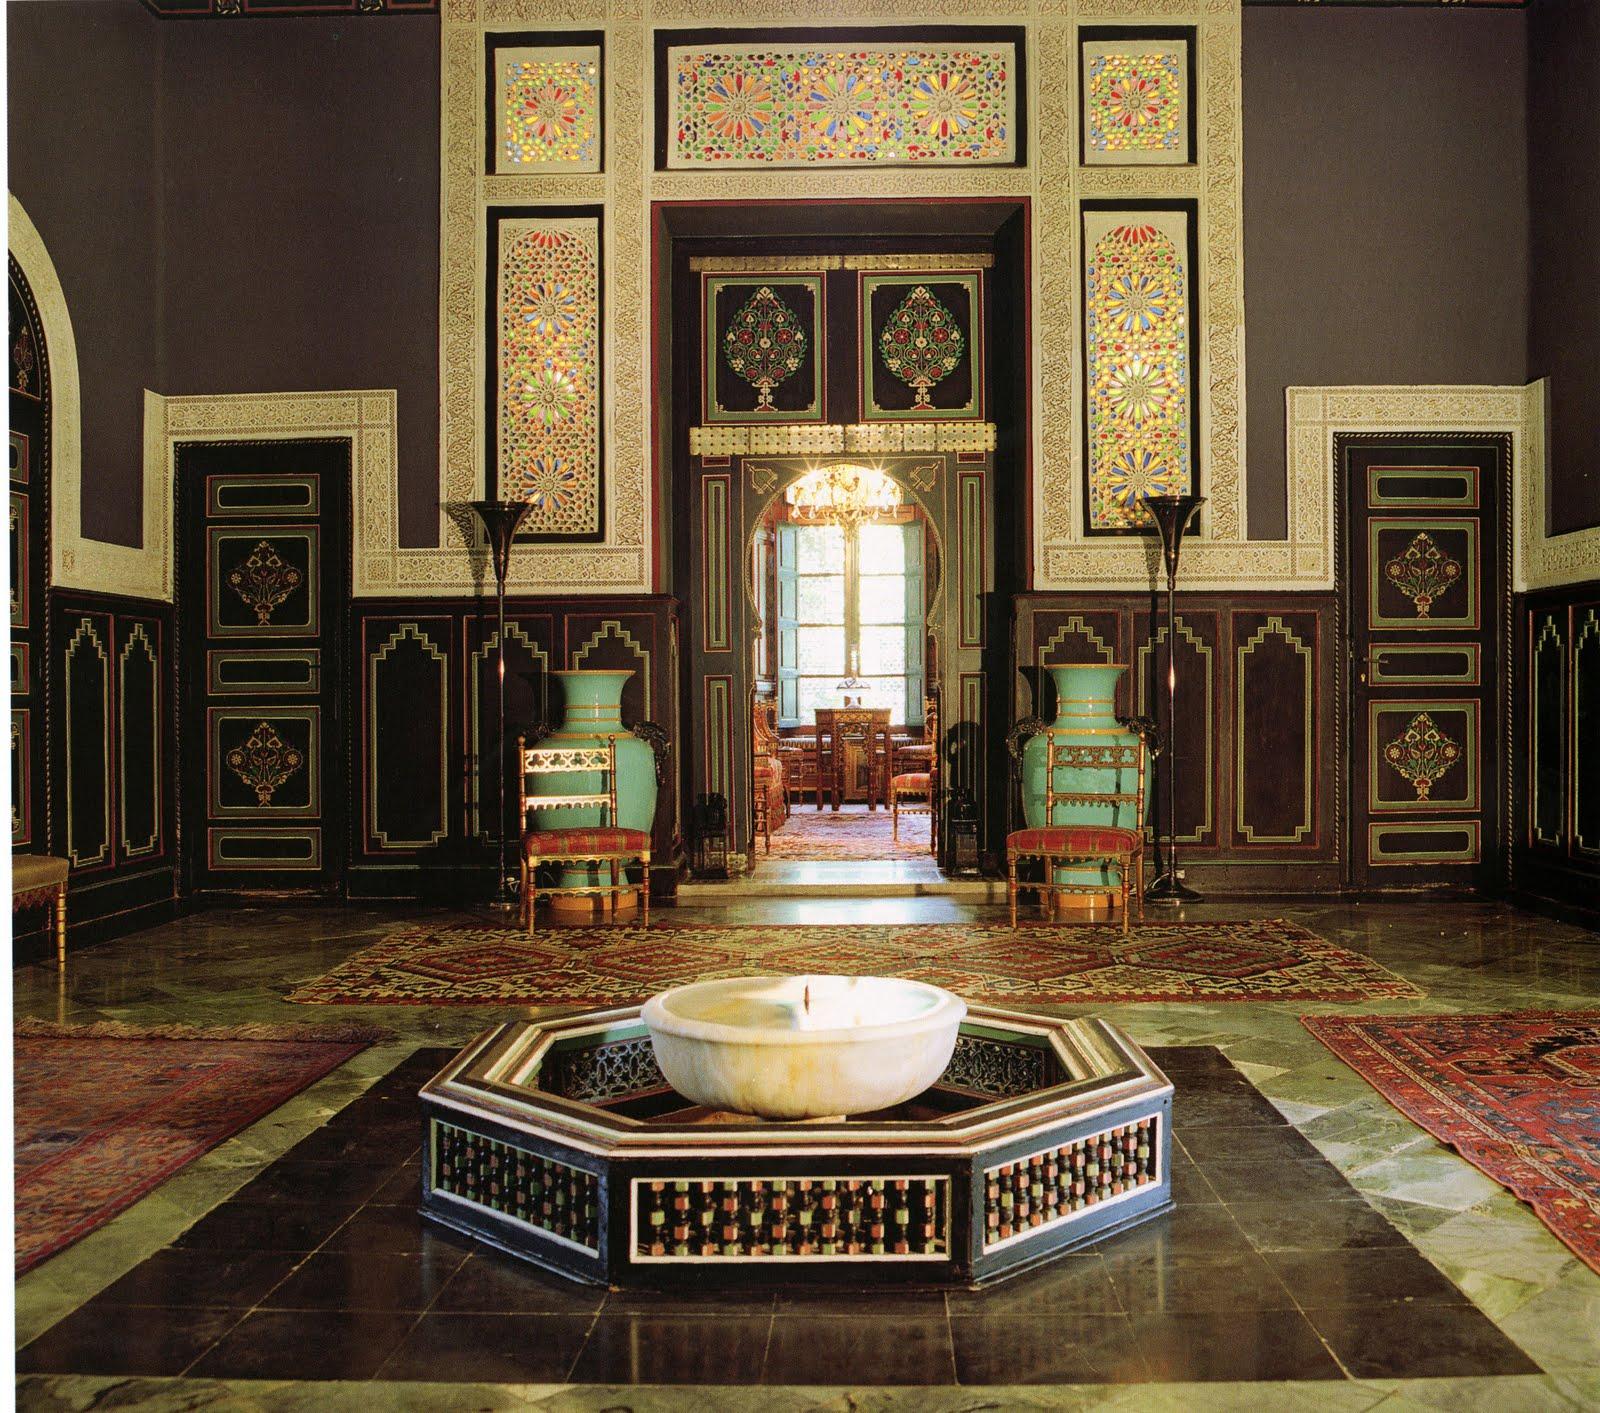 cityzenart: Yves Saint Laurent Marrakech Interior